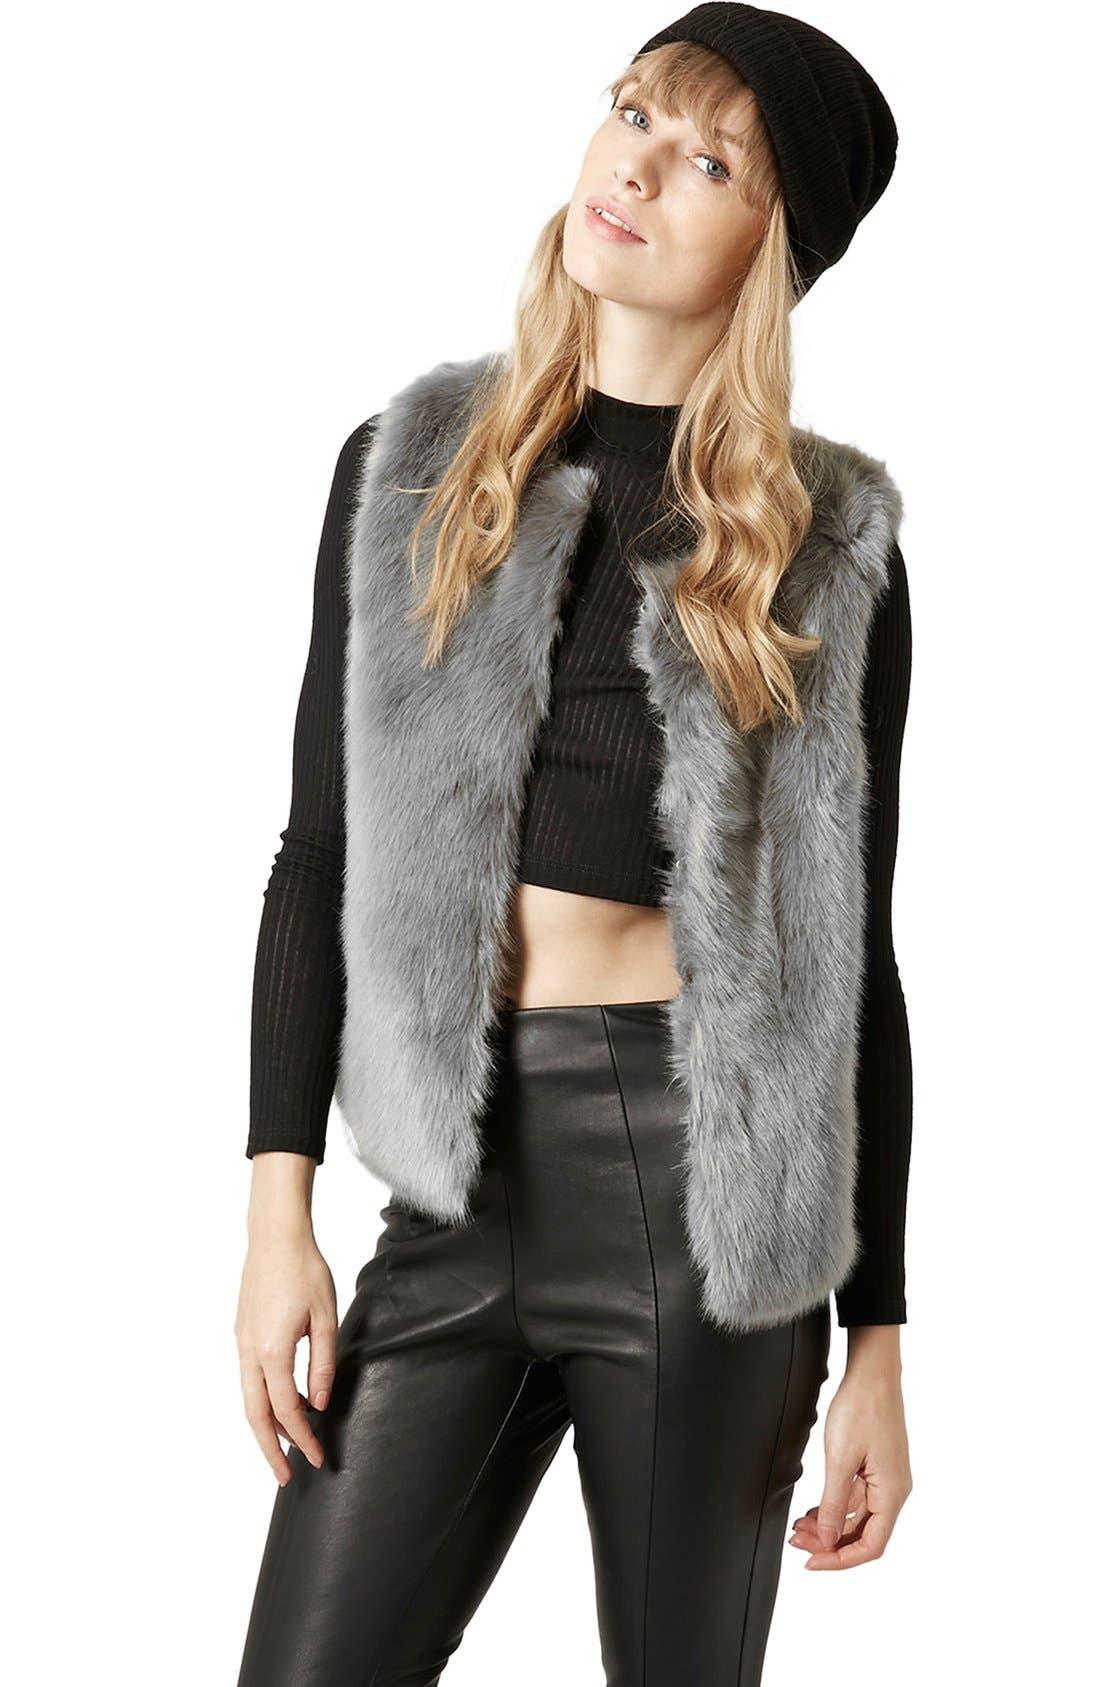 Alternate Image 1 Selected - Topshop Faux Fur Gilet Vest